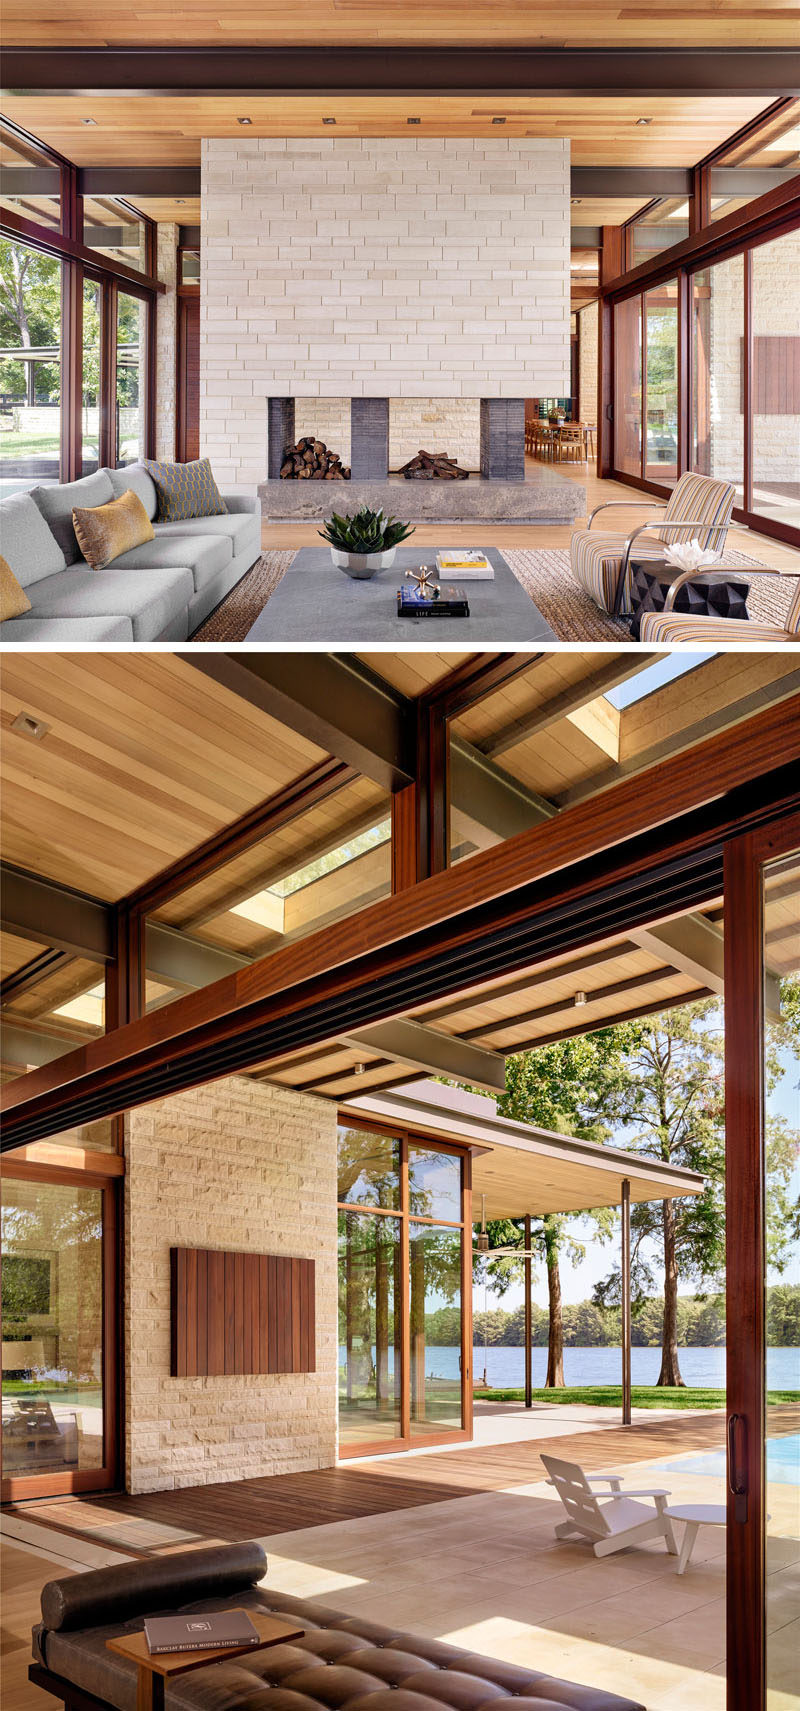 Texas Lakeside House Has An Exterior Of Wood Limestone